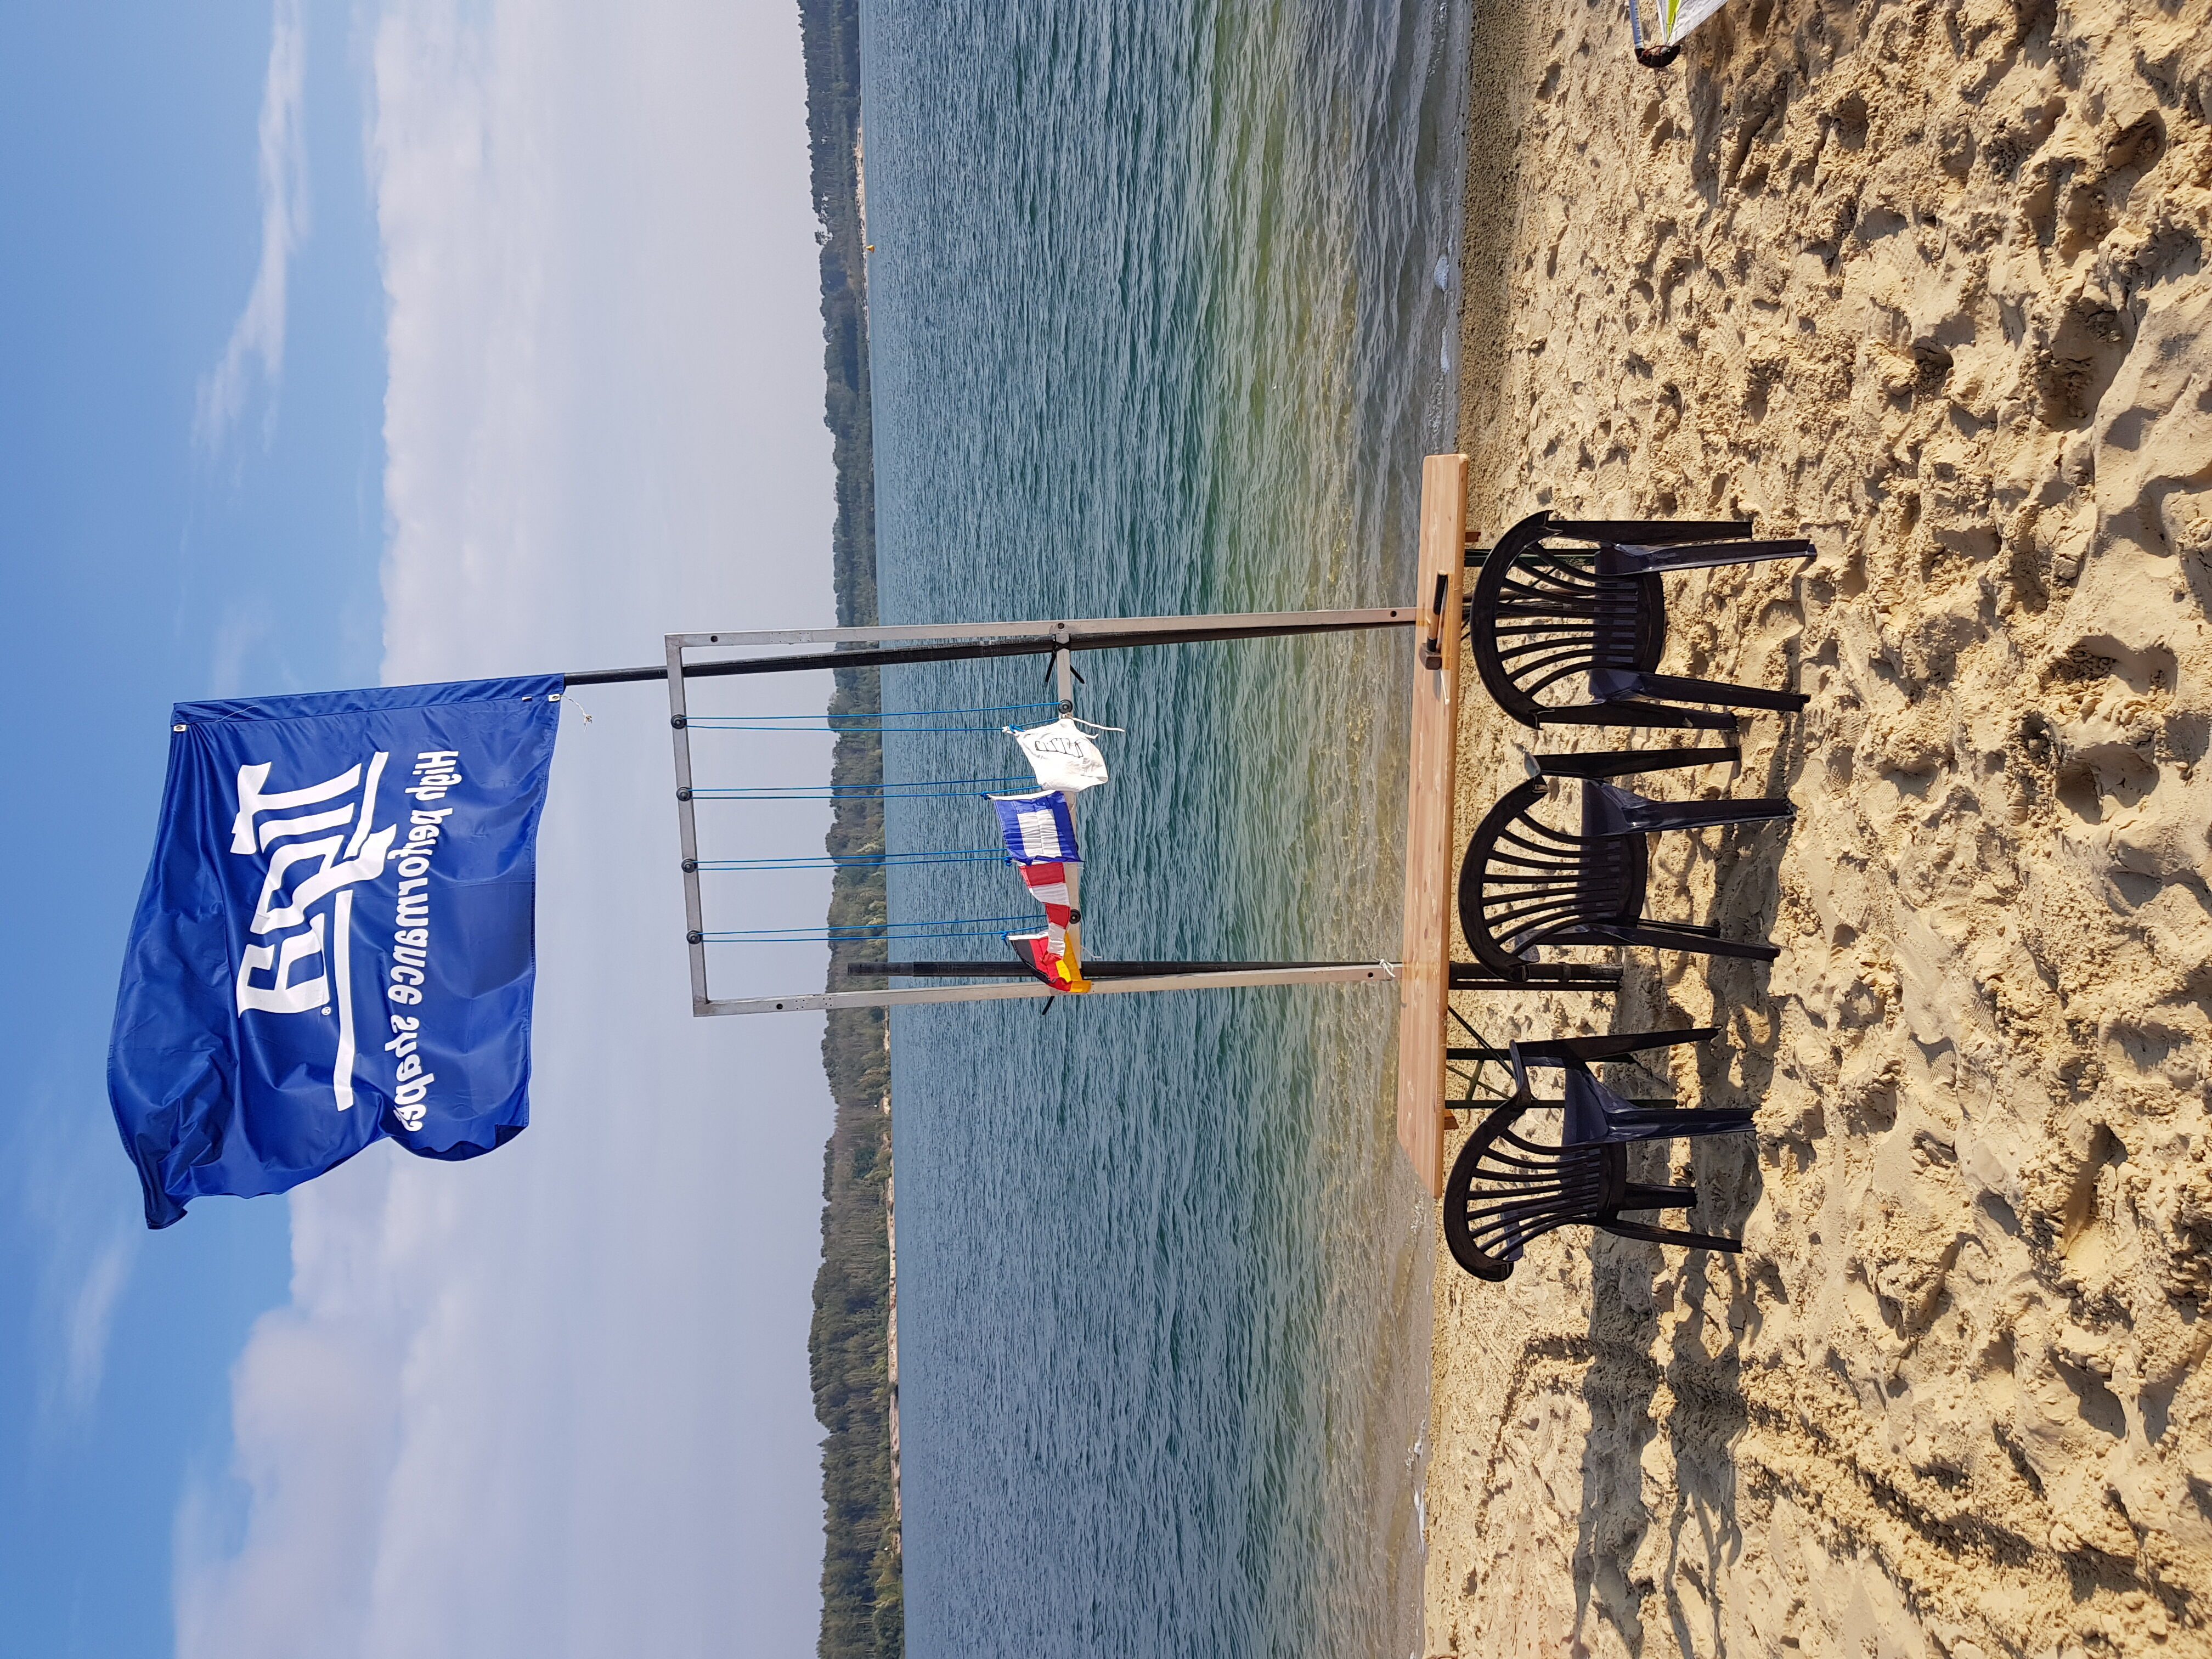 Windsurfing Regatta am Silbersee II